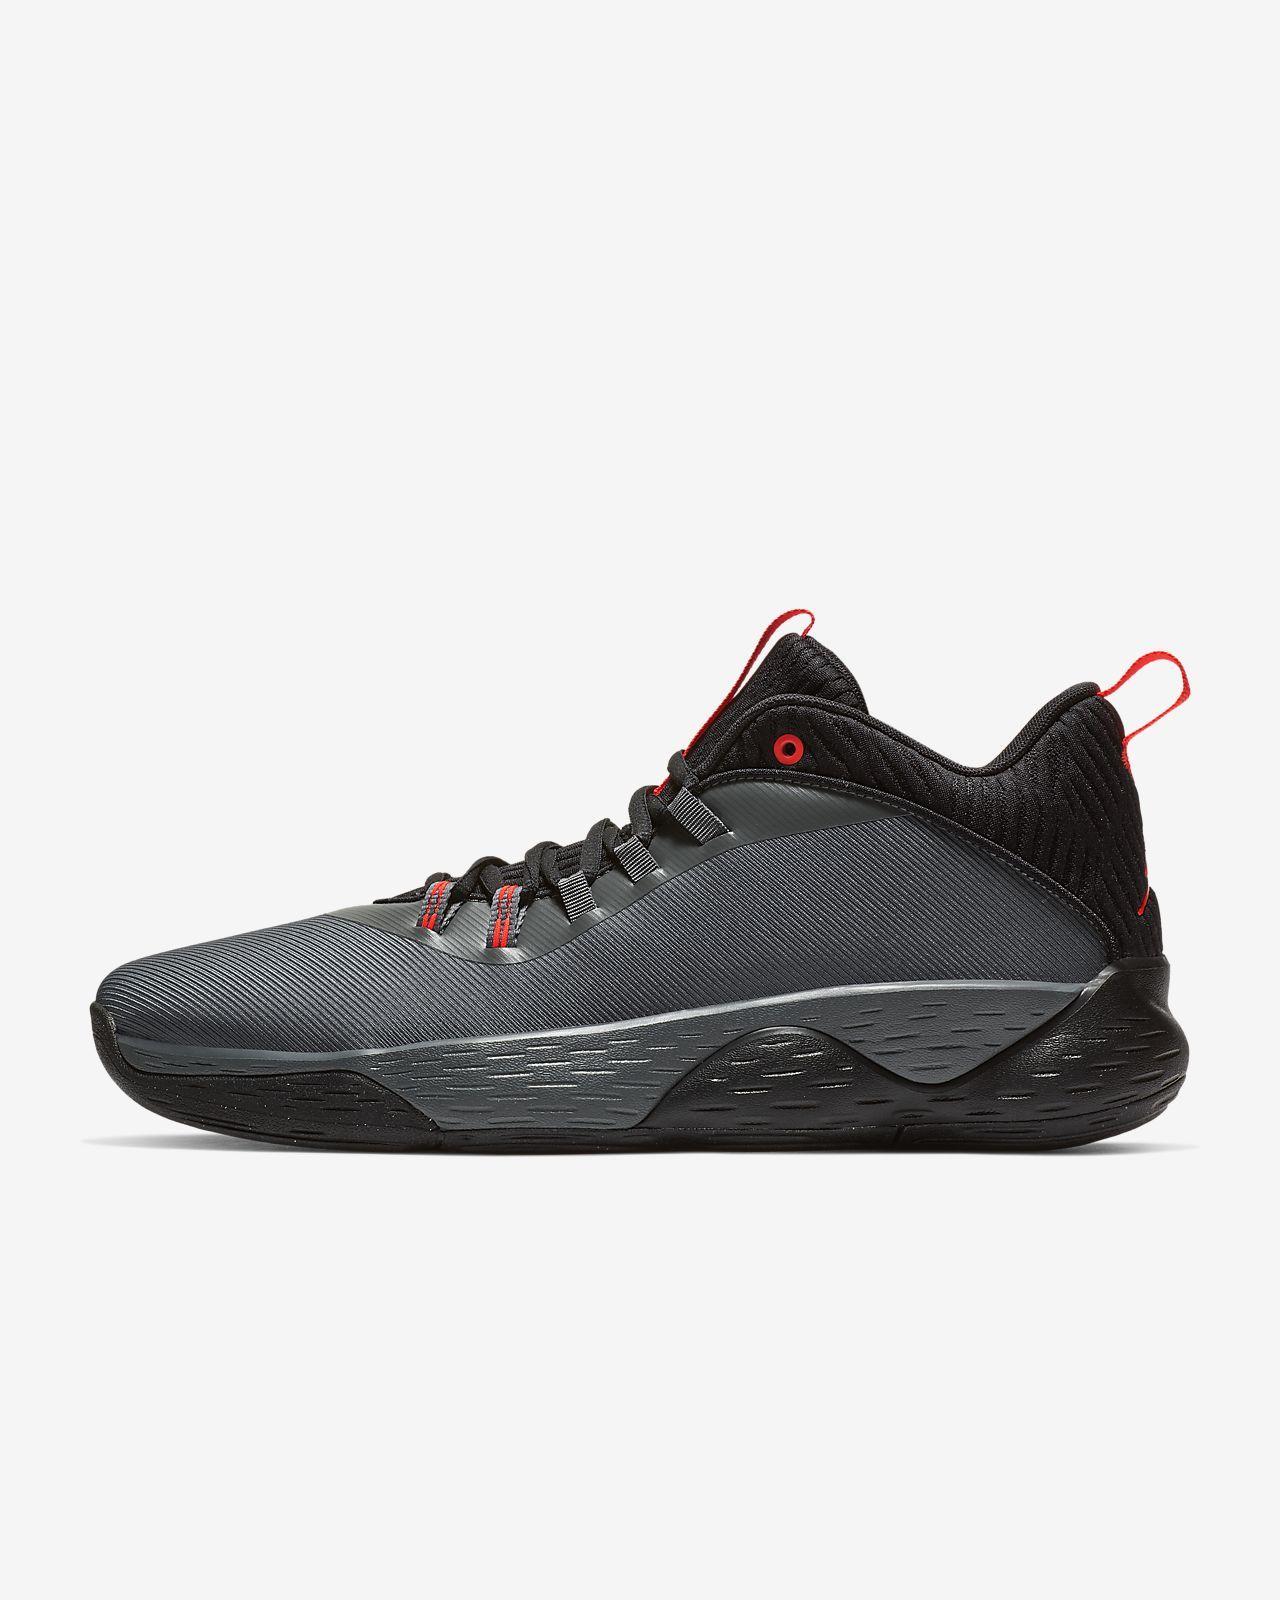 Jordan Super.Fly MVP Low Herren-Basketballschuh